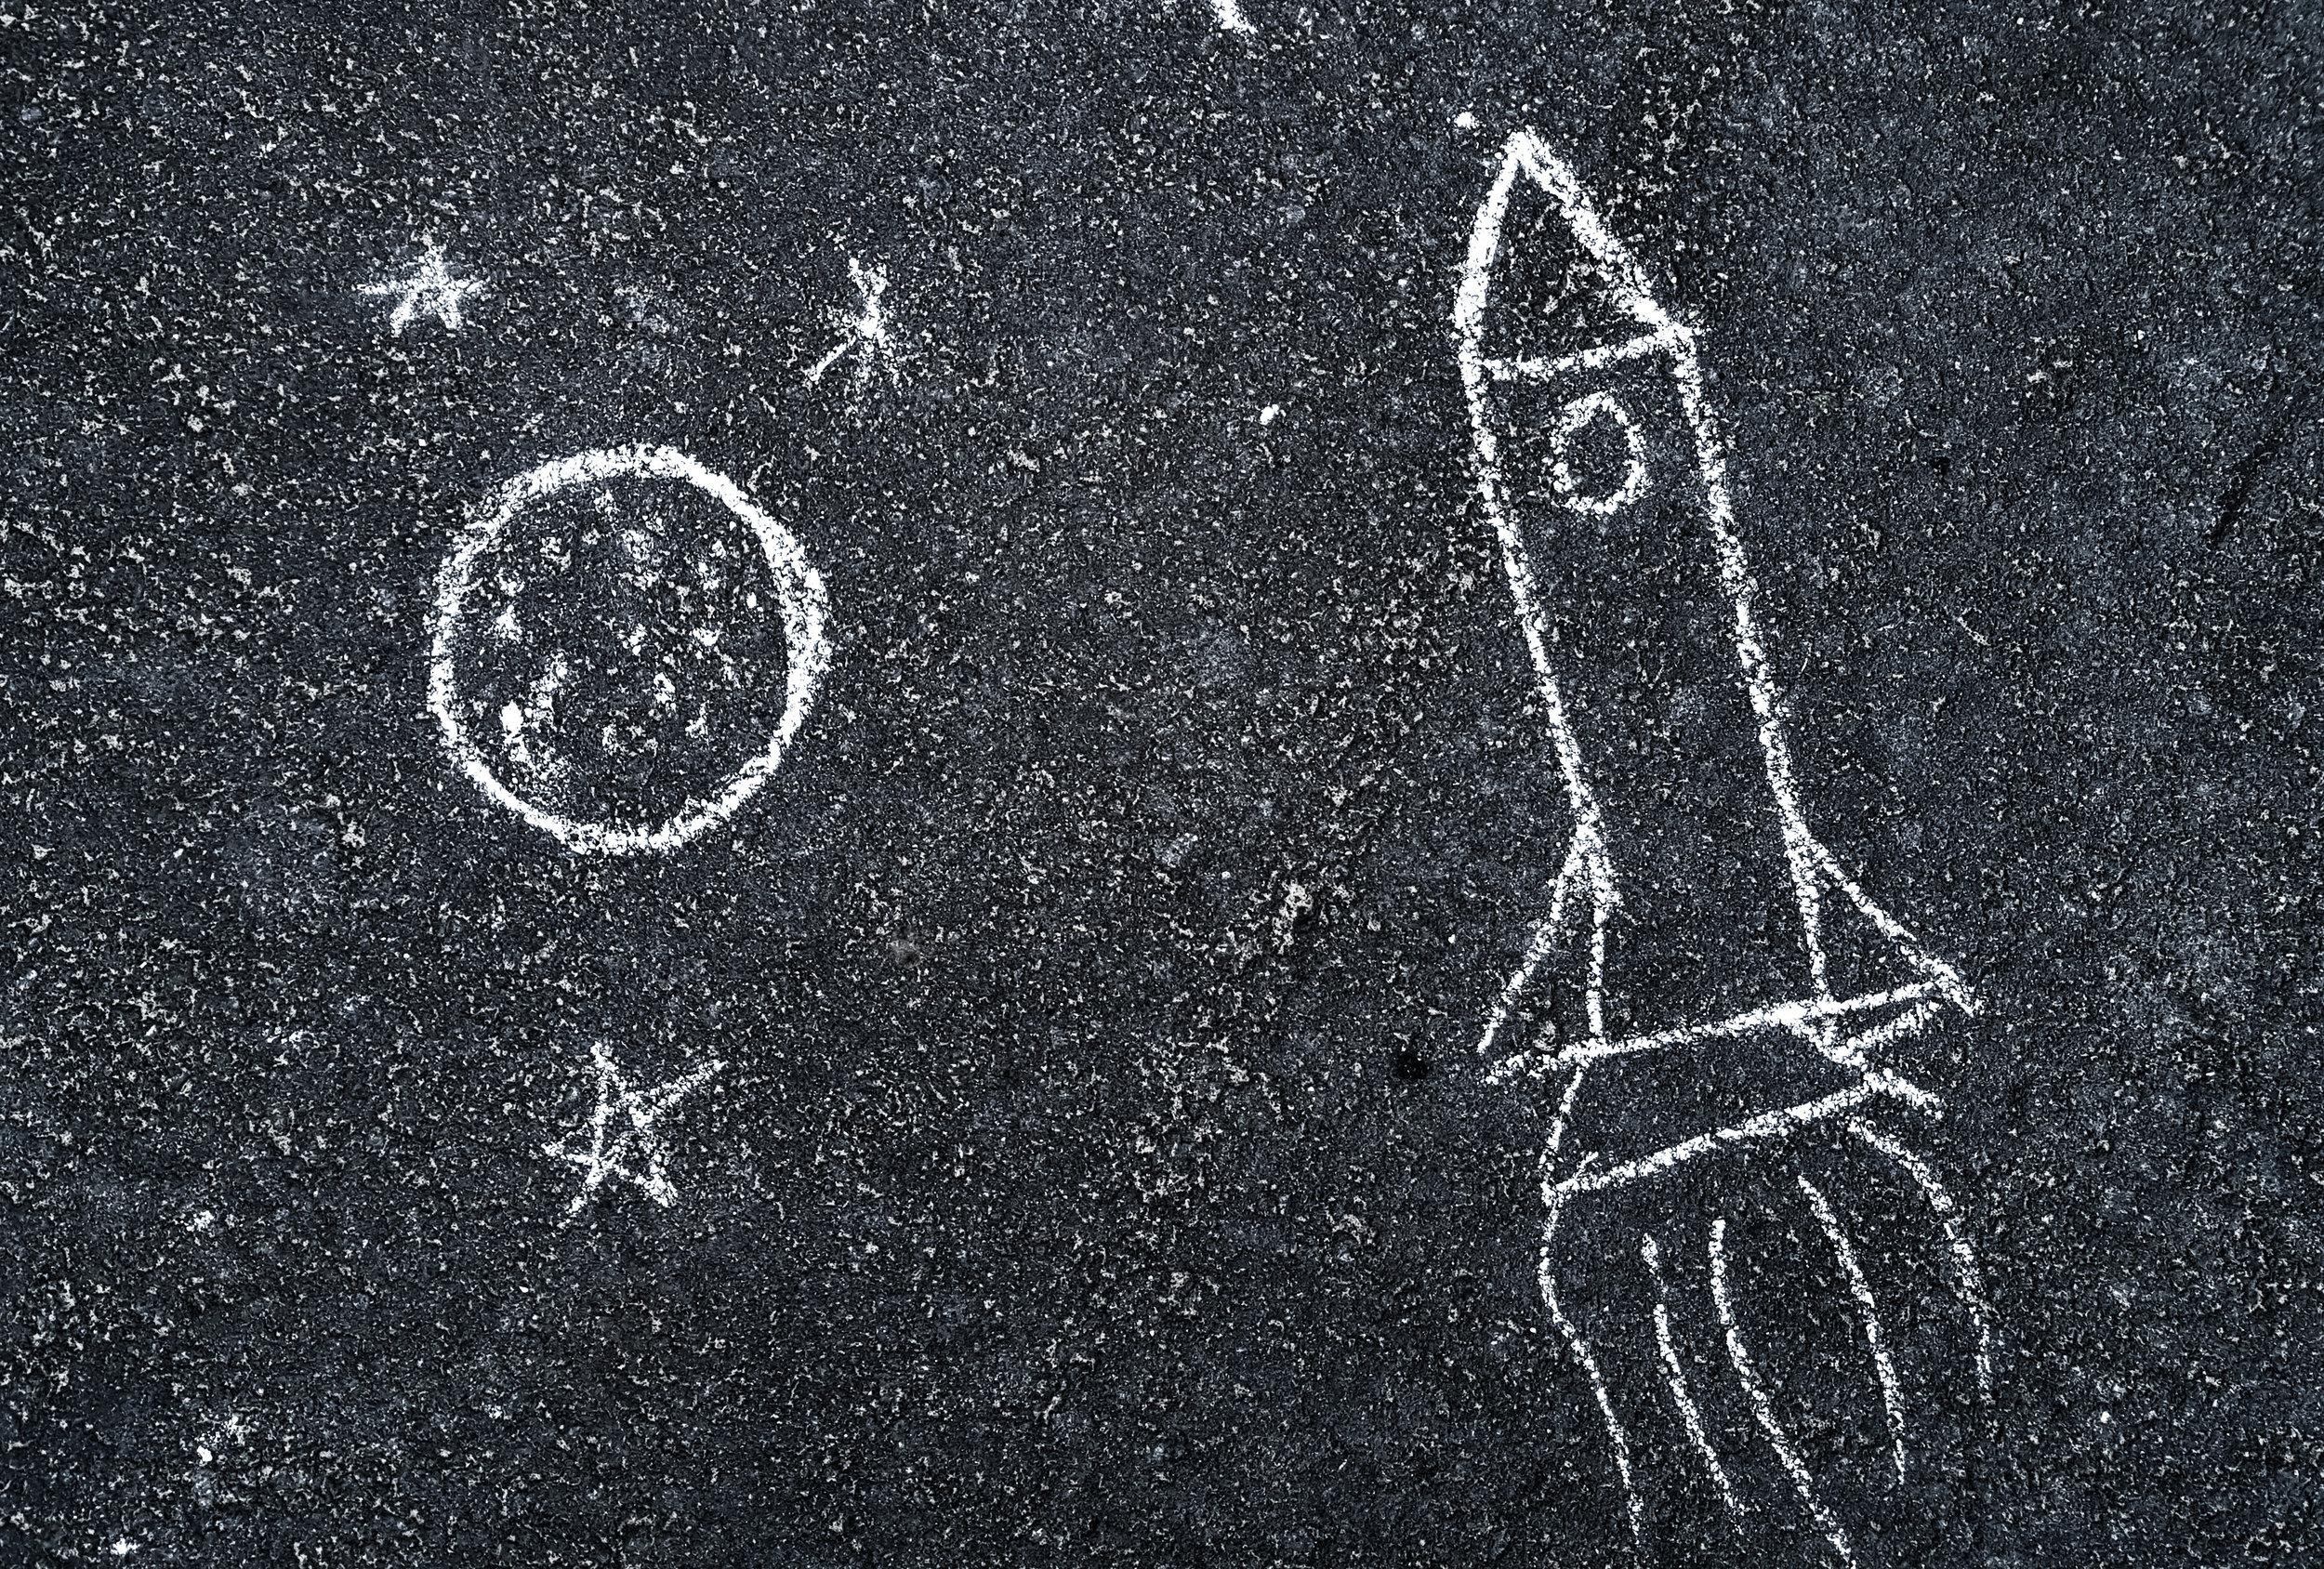 Canva - Chalk Drawing.jpg